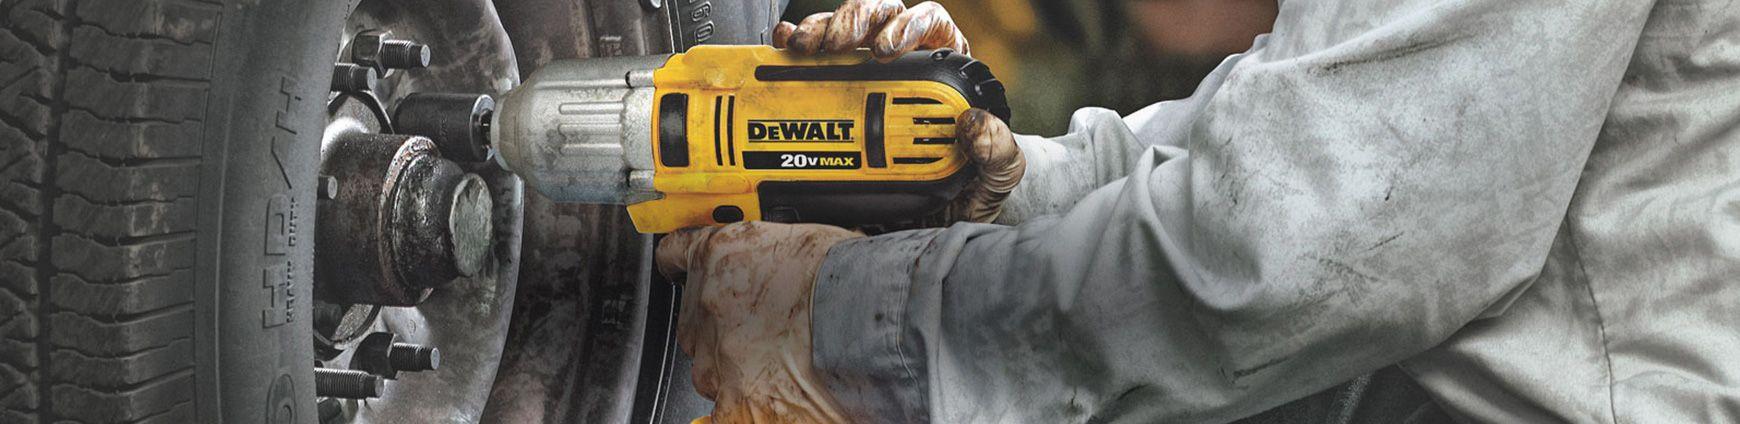 dewalt tools & accessories   canadian tire   canadian tire